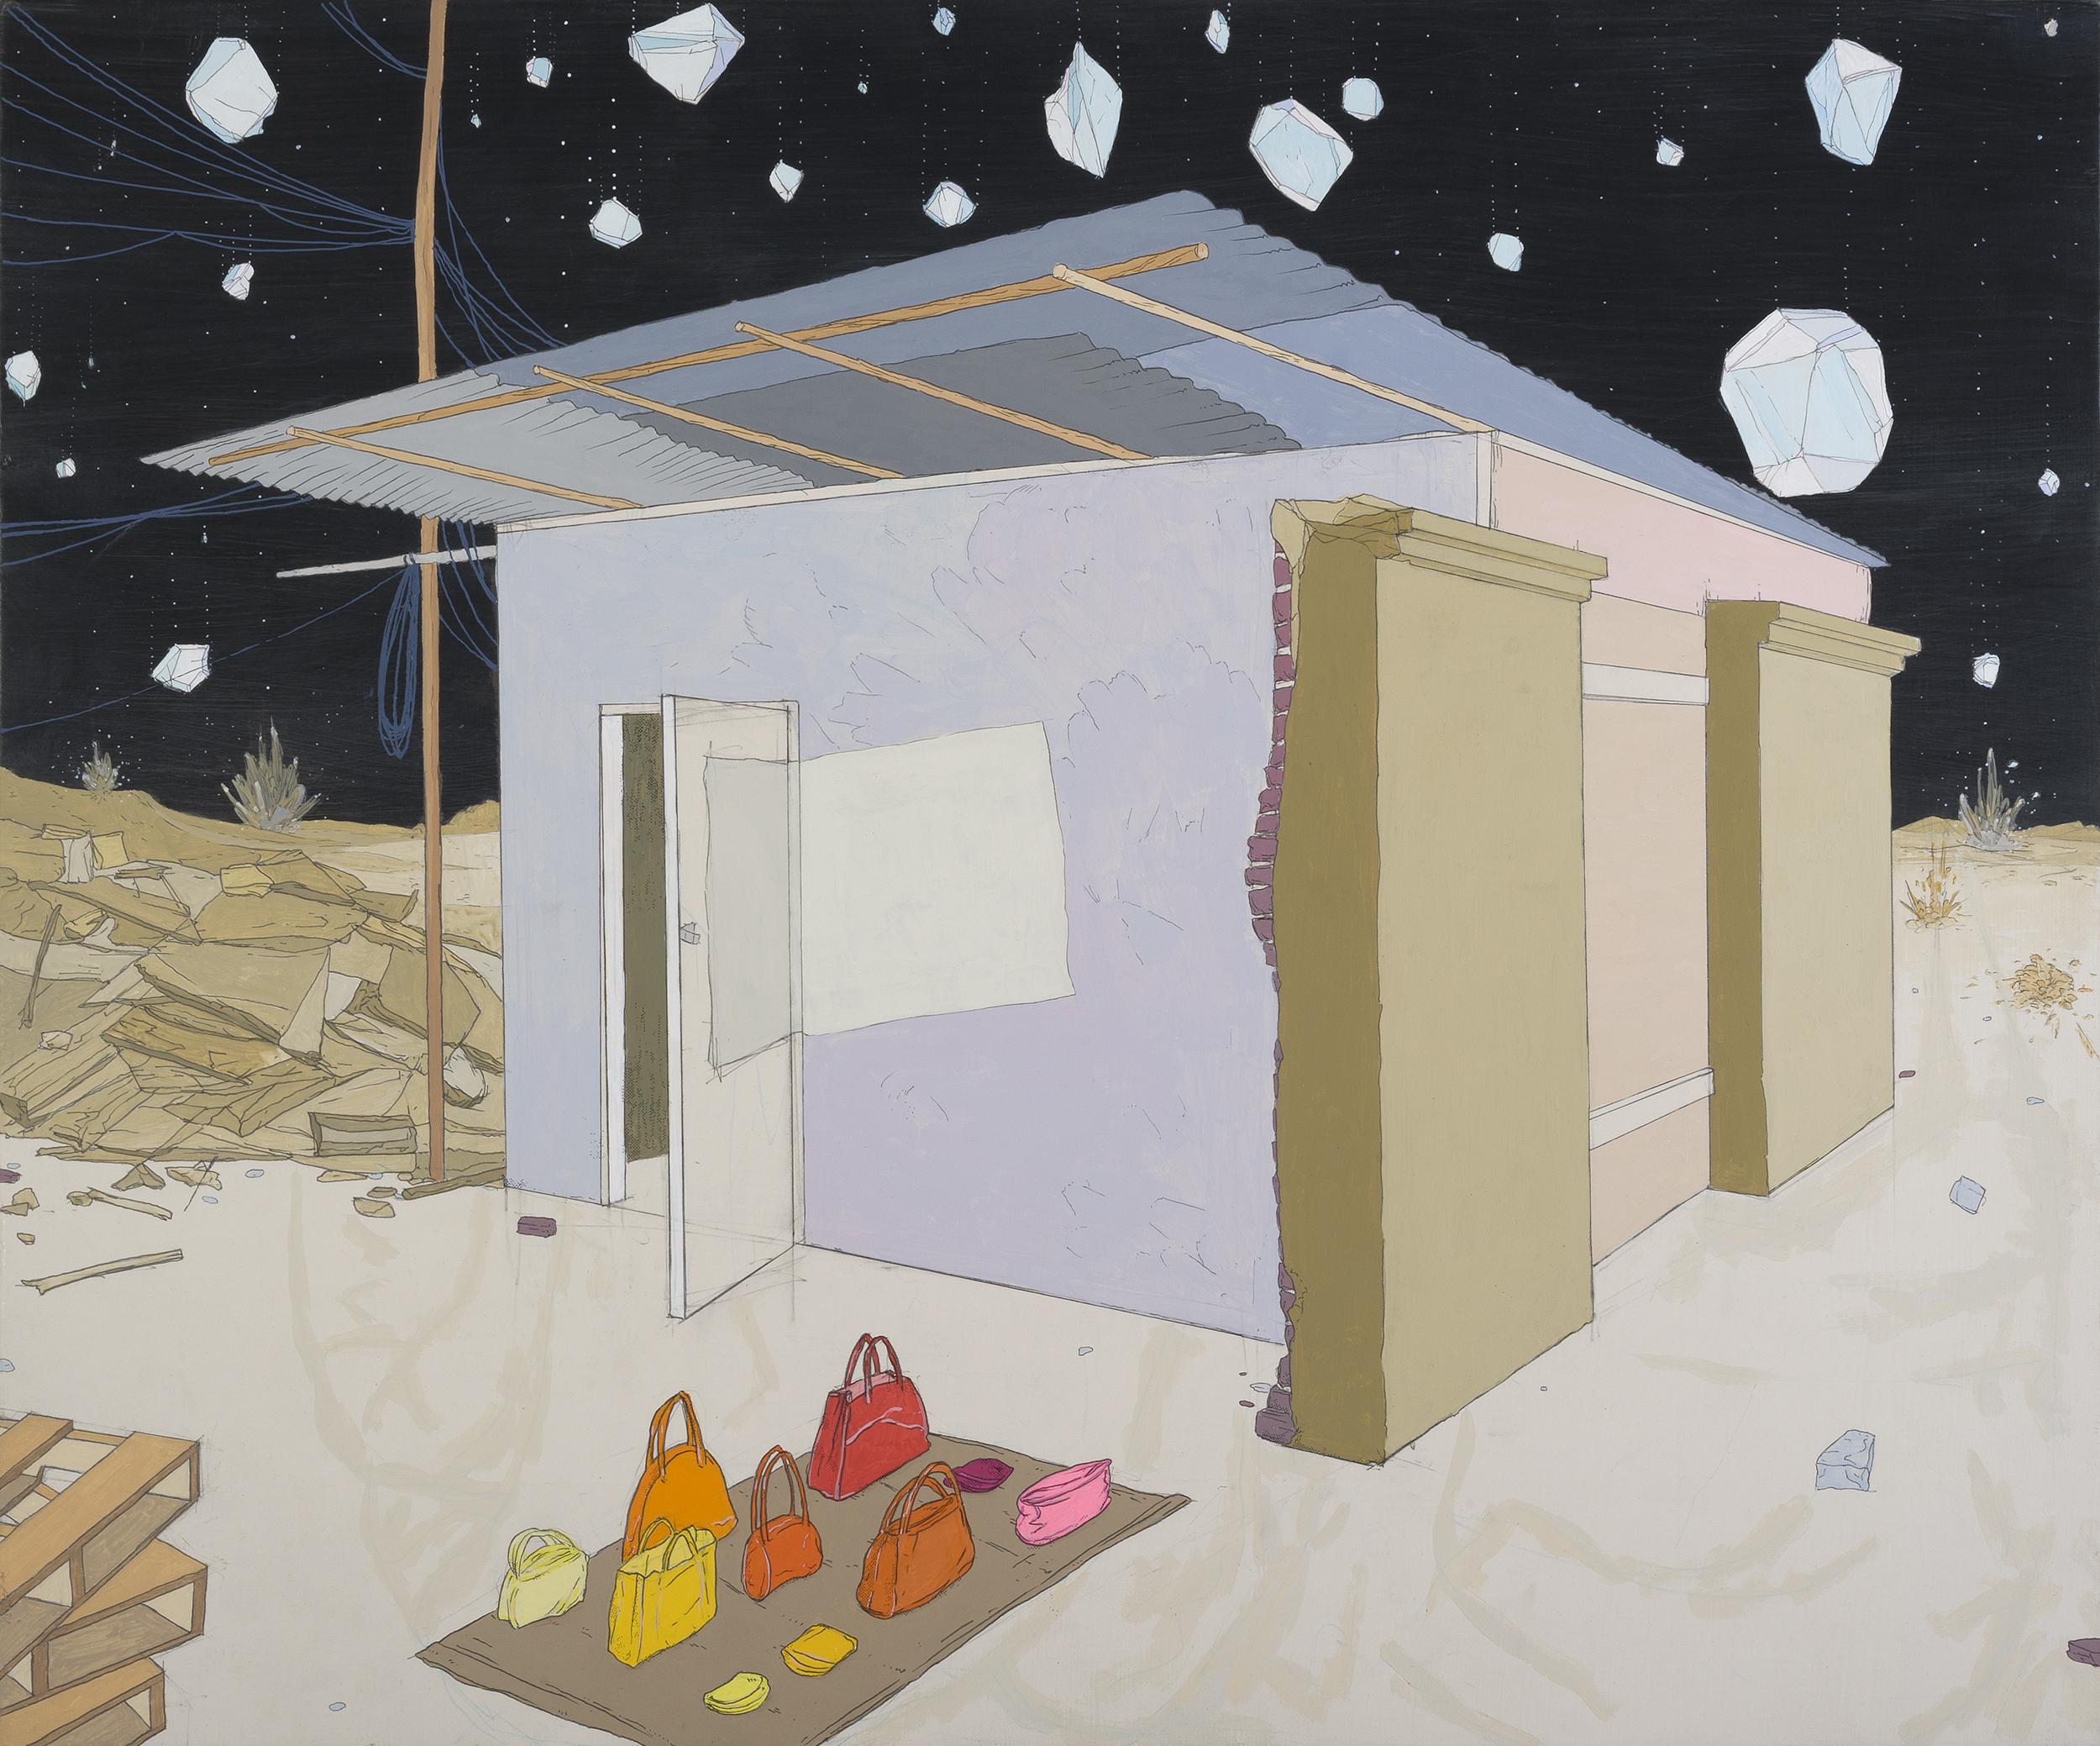 "Ghost Cargo  Graphite, gouache, acrylic on canvas, 20x24"" 2013"